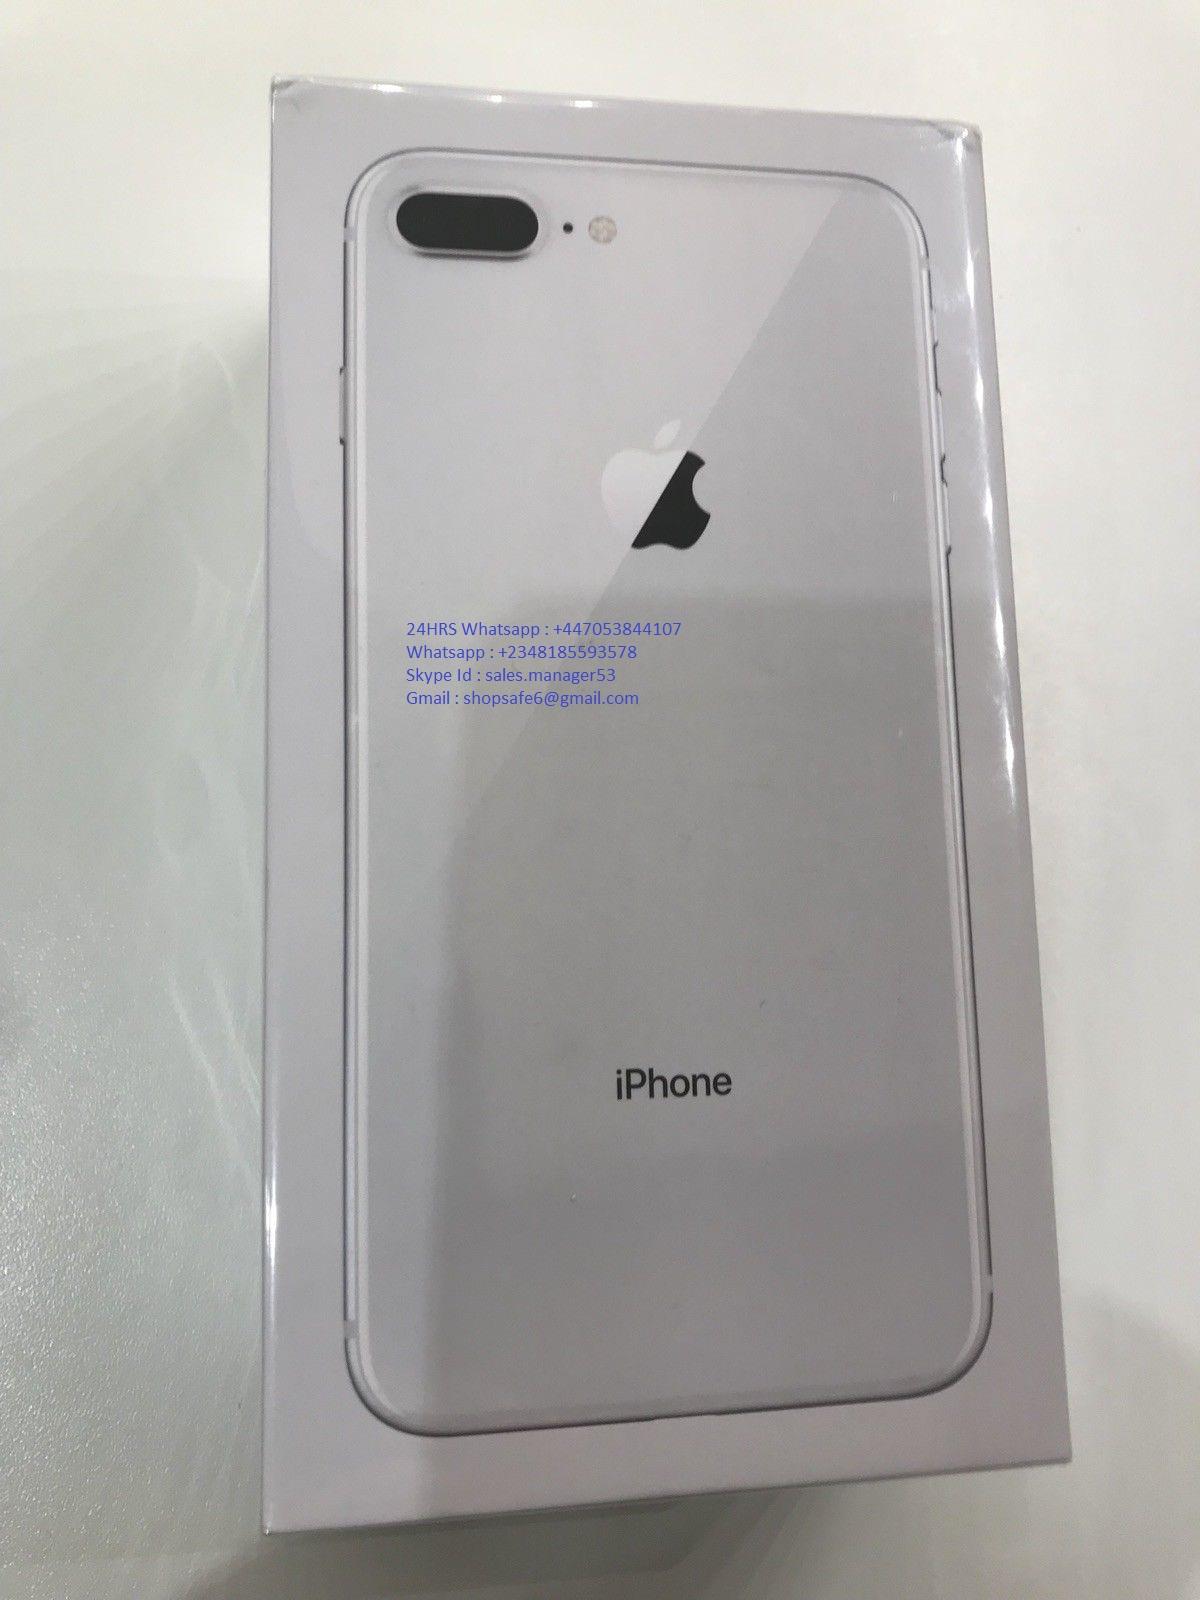 Xmas Bonanza Apple iPhone 8 256GB/Apple iPhone 8 Plus 256GB $500